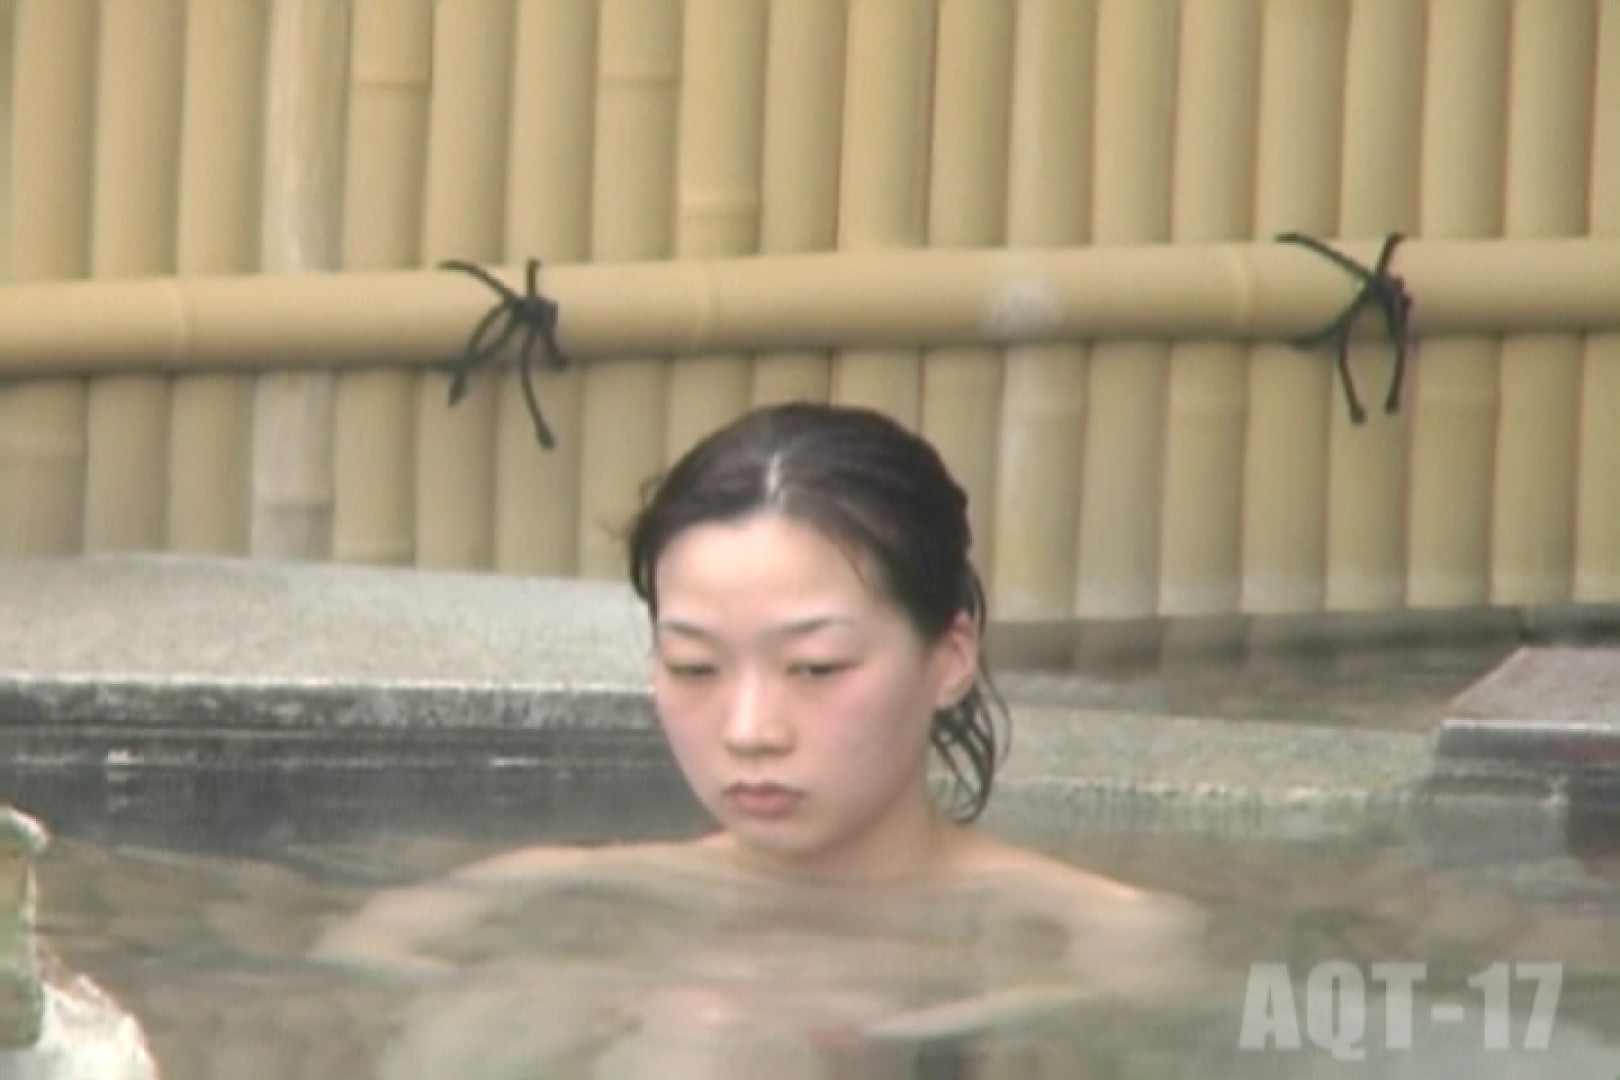 Aquaな露天風呂Vol.848 盗撮師作品  86pic 24